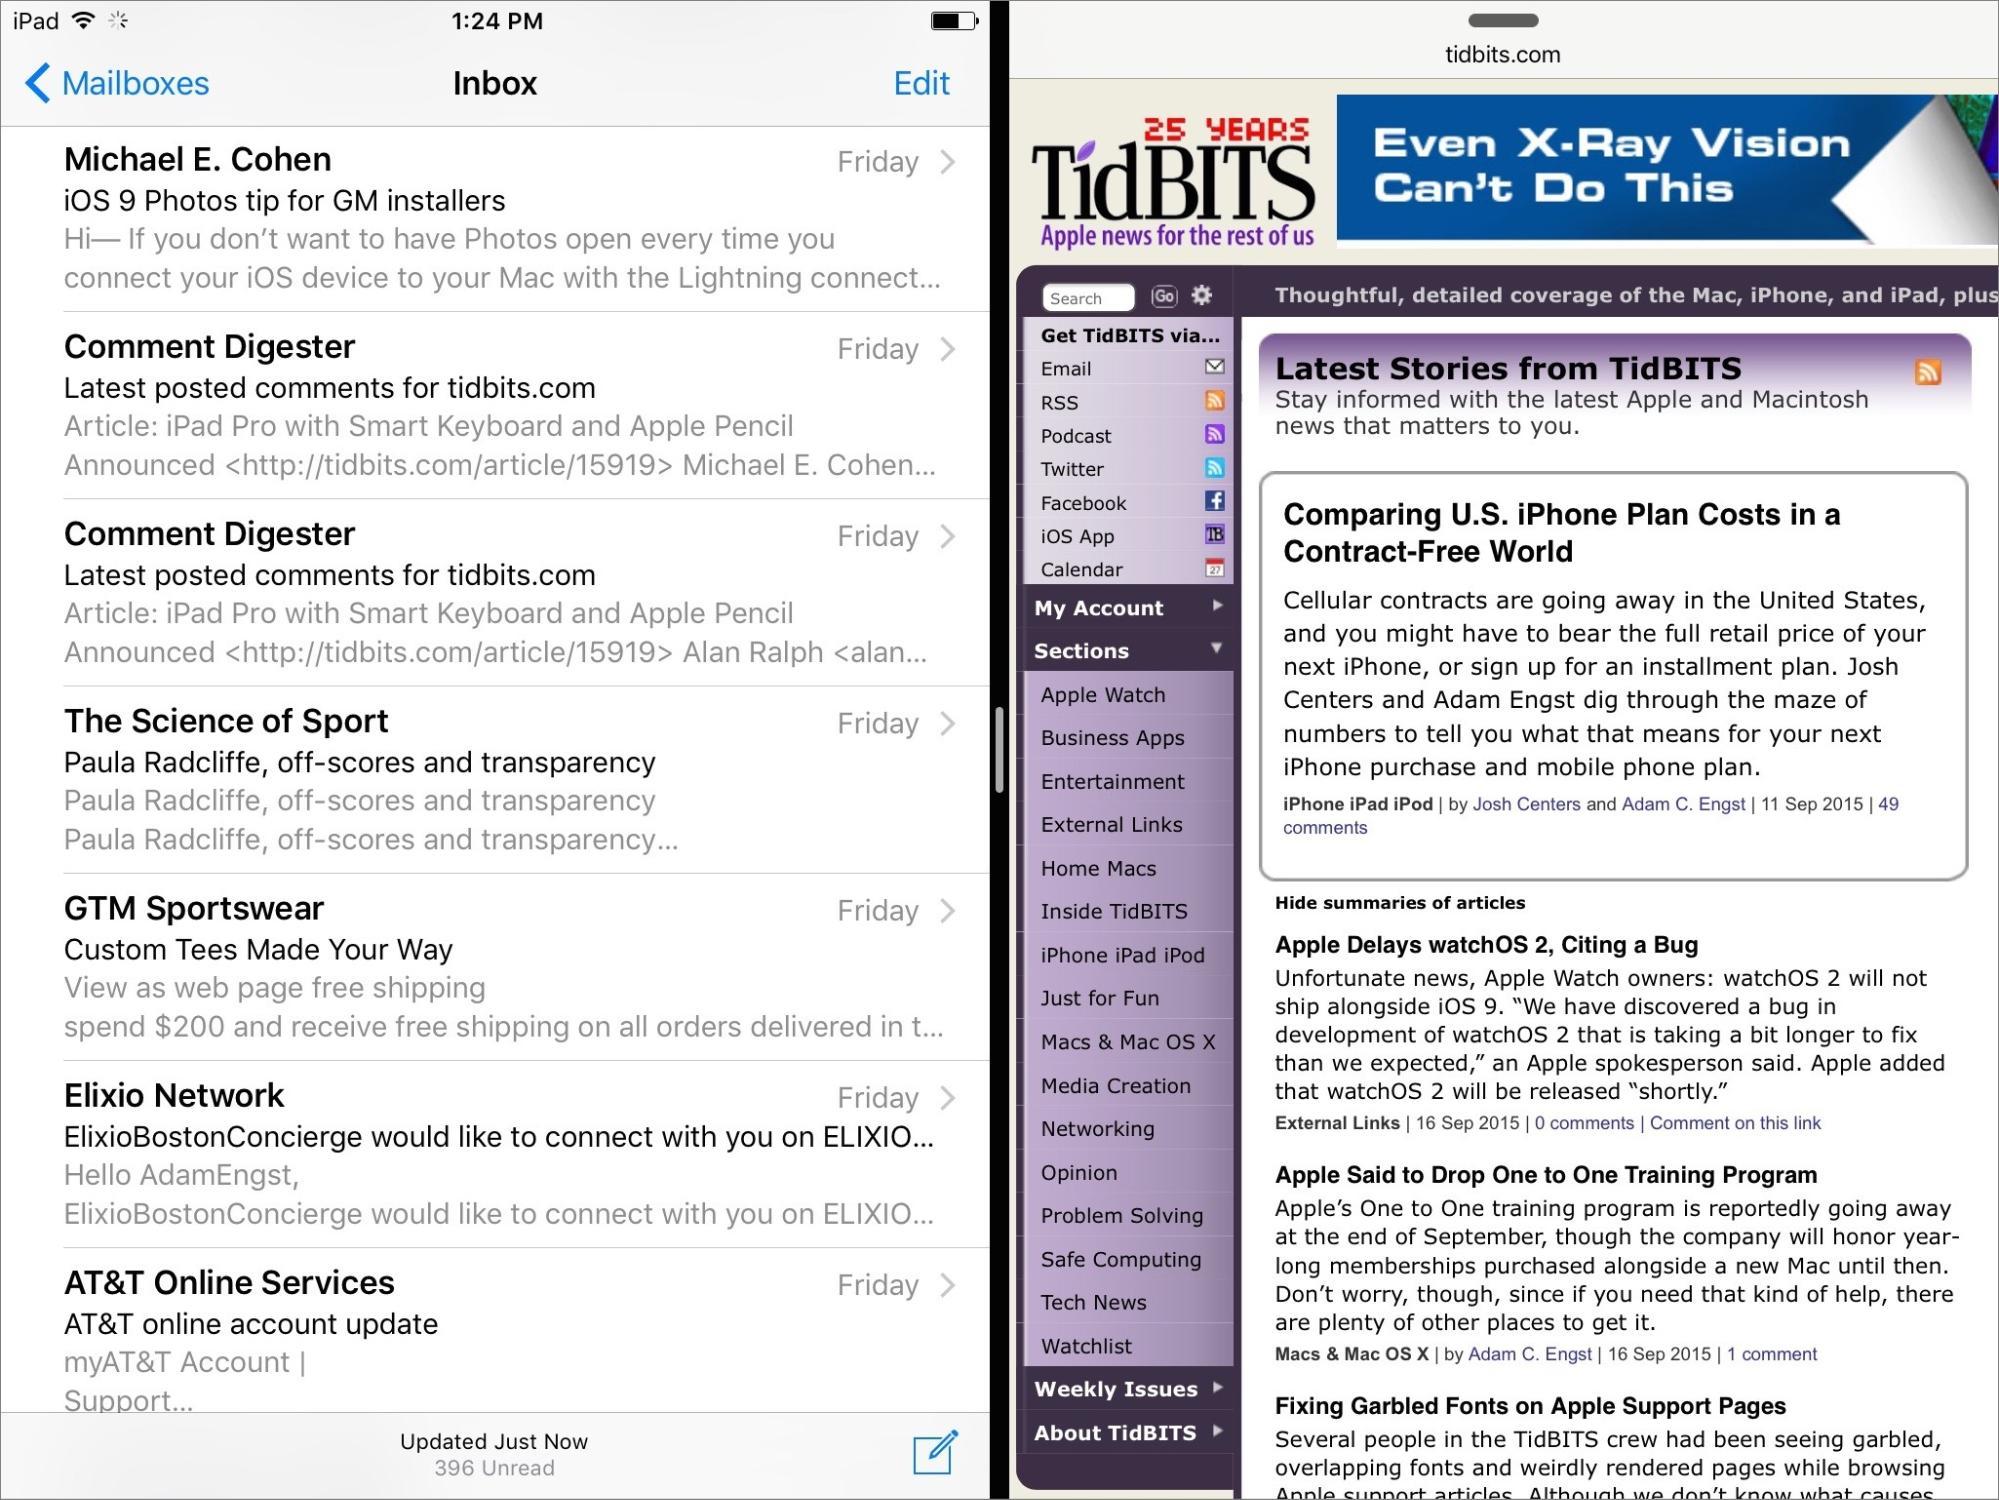 iOS 9: TidBITS Answers Your Questions - TidBITS